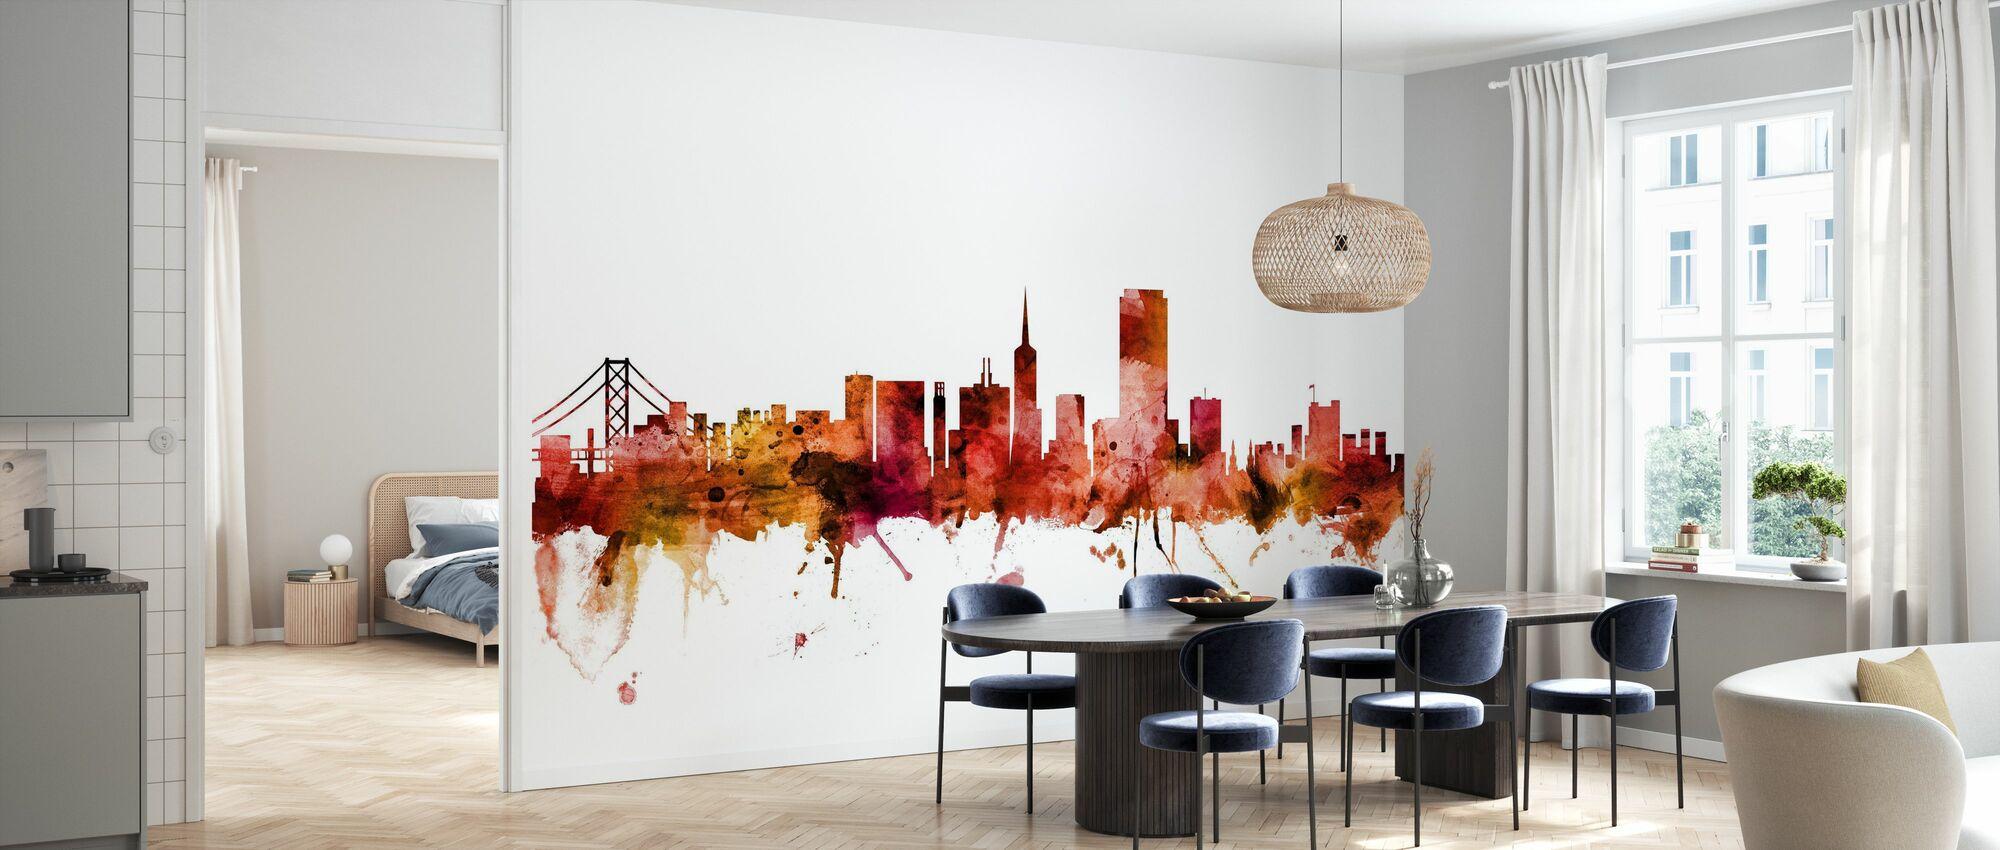 San Francisco California Skyline - Wallpaper - Kitchen